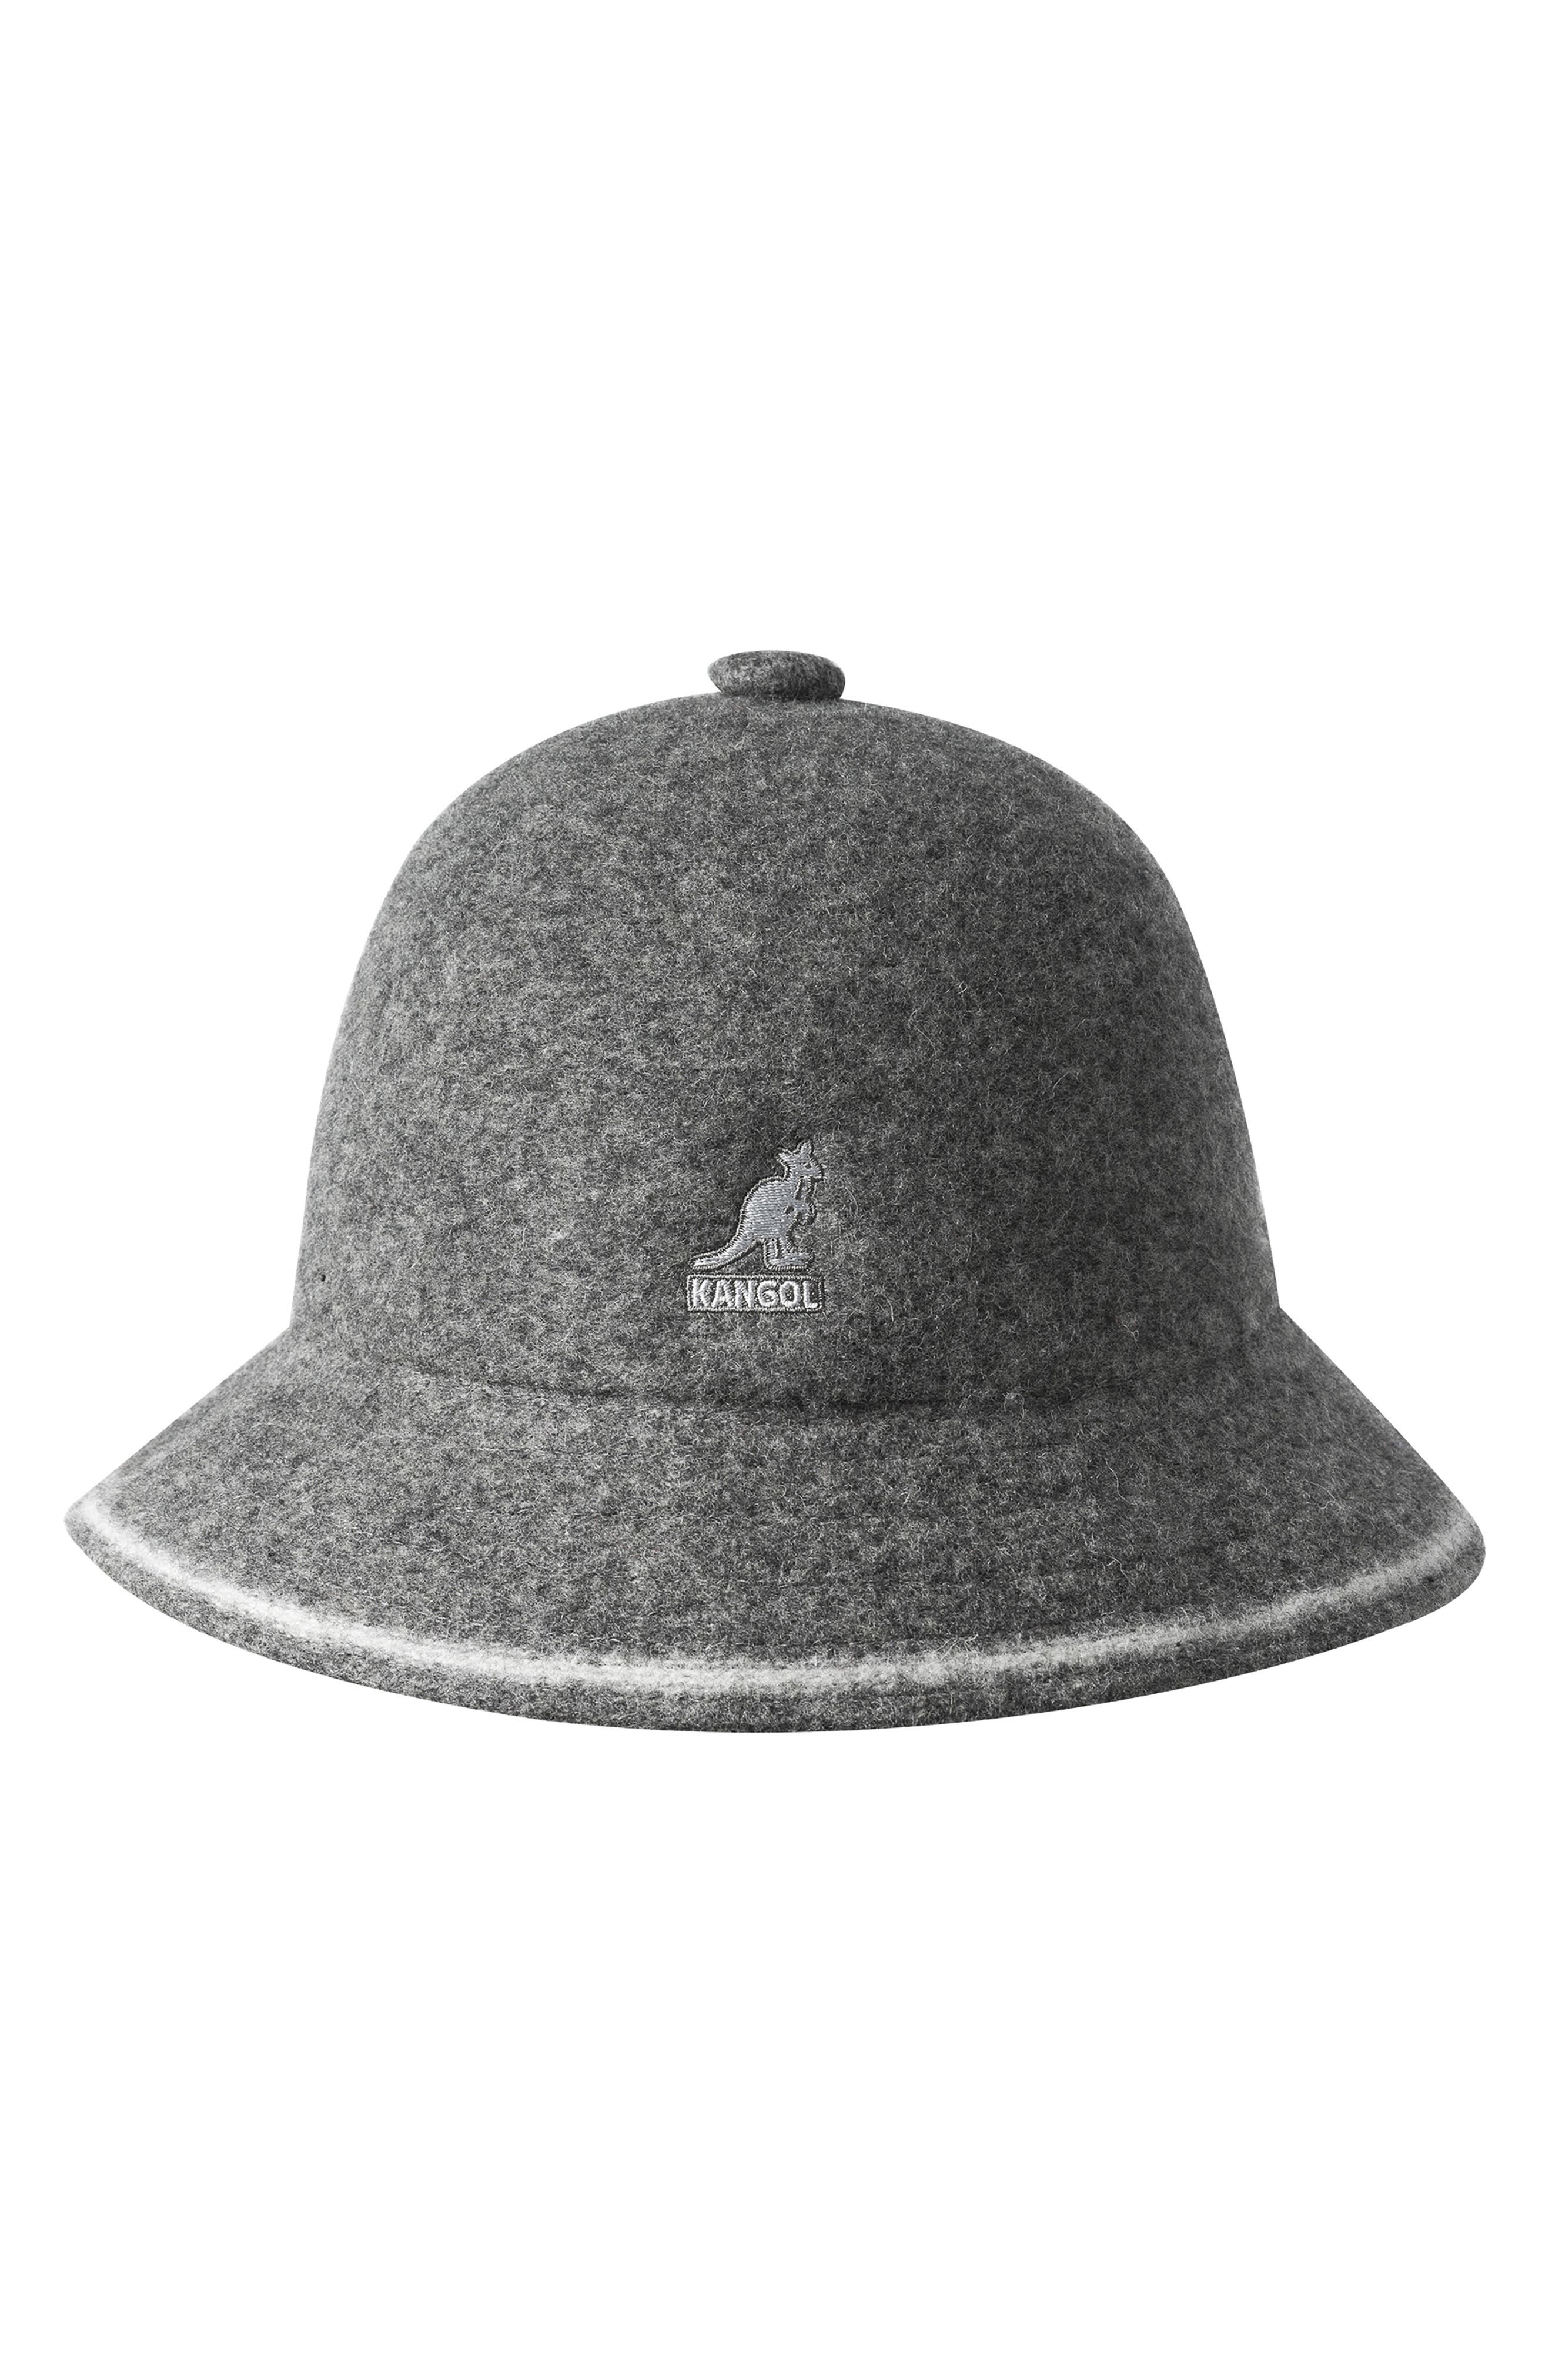 KANGOL Cloche Hat - Grey in Flan/ Off Wht